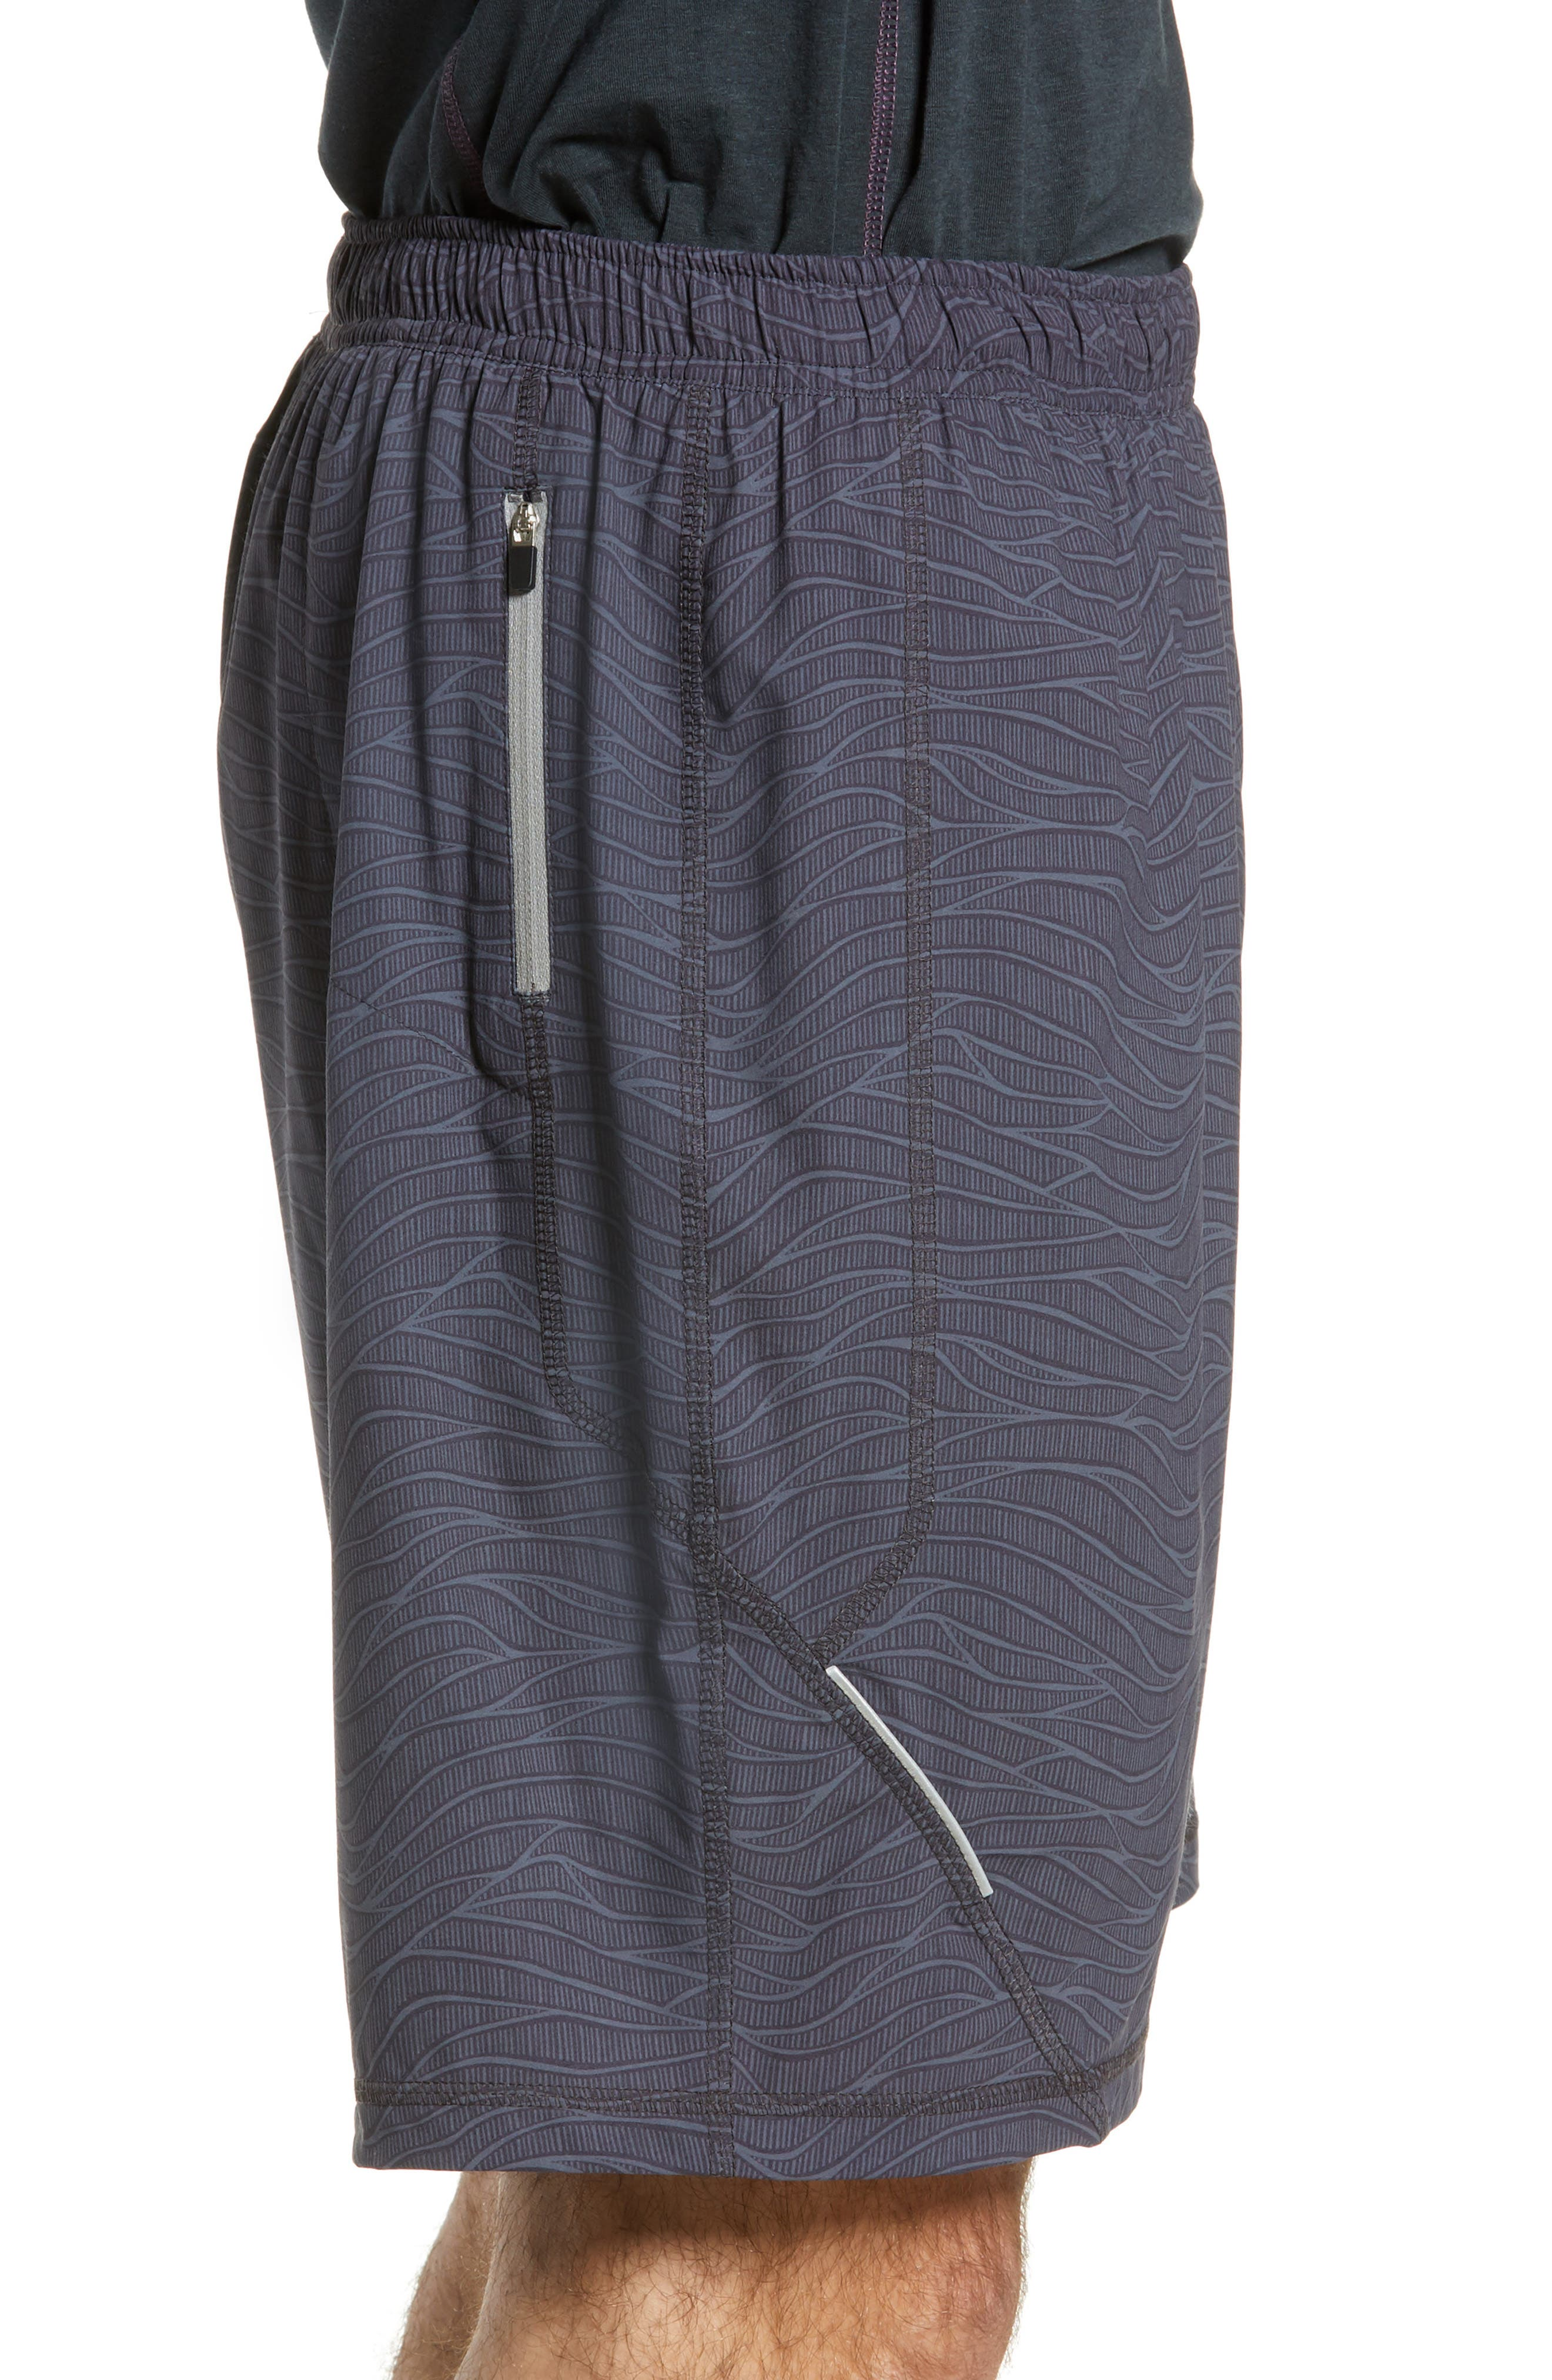 TASC PERFORMANCE, Propulsion Athletic Shorts, Alternate thumbnail 4, color, BLACK SONIC WAVE